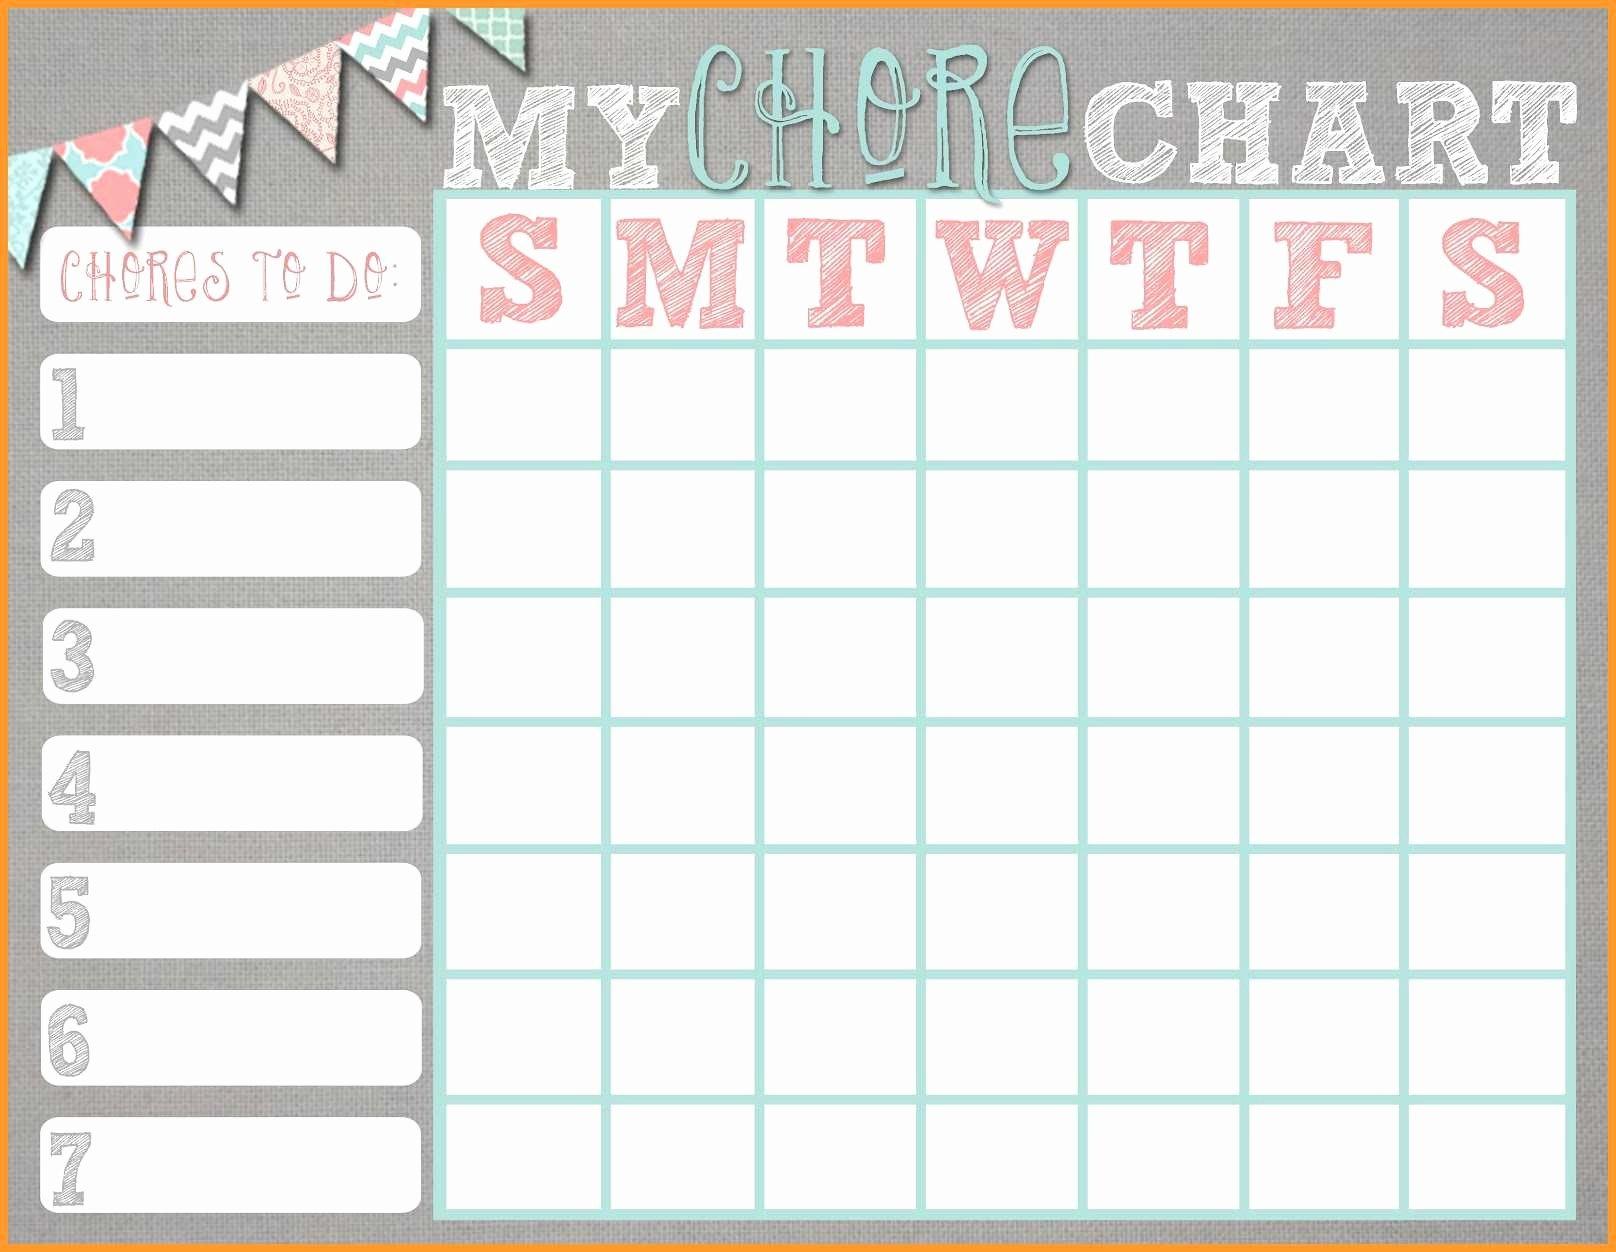 Editable Chore Chart Template Luxury 10 11 Free Editable Printable - Free Editable Printable Chore Charts